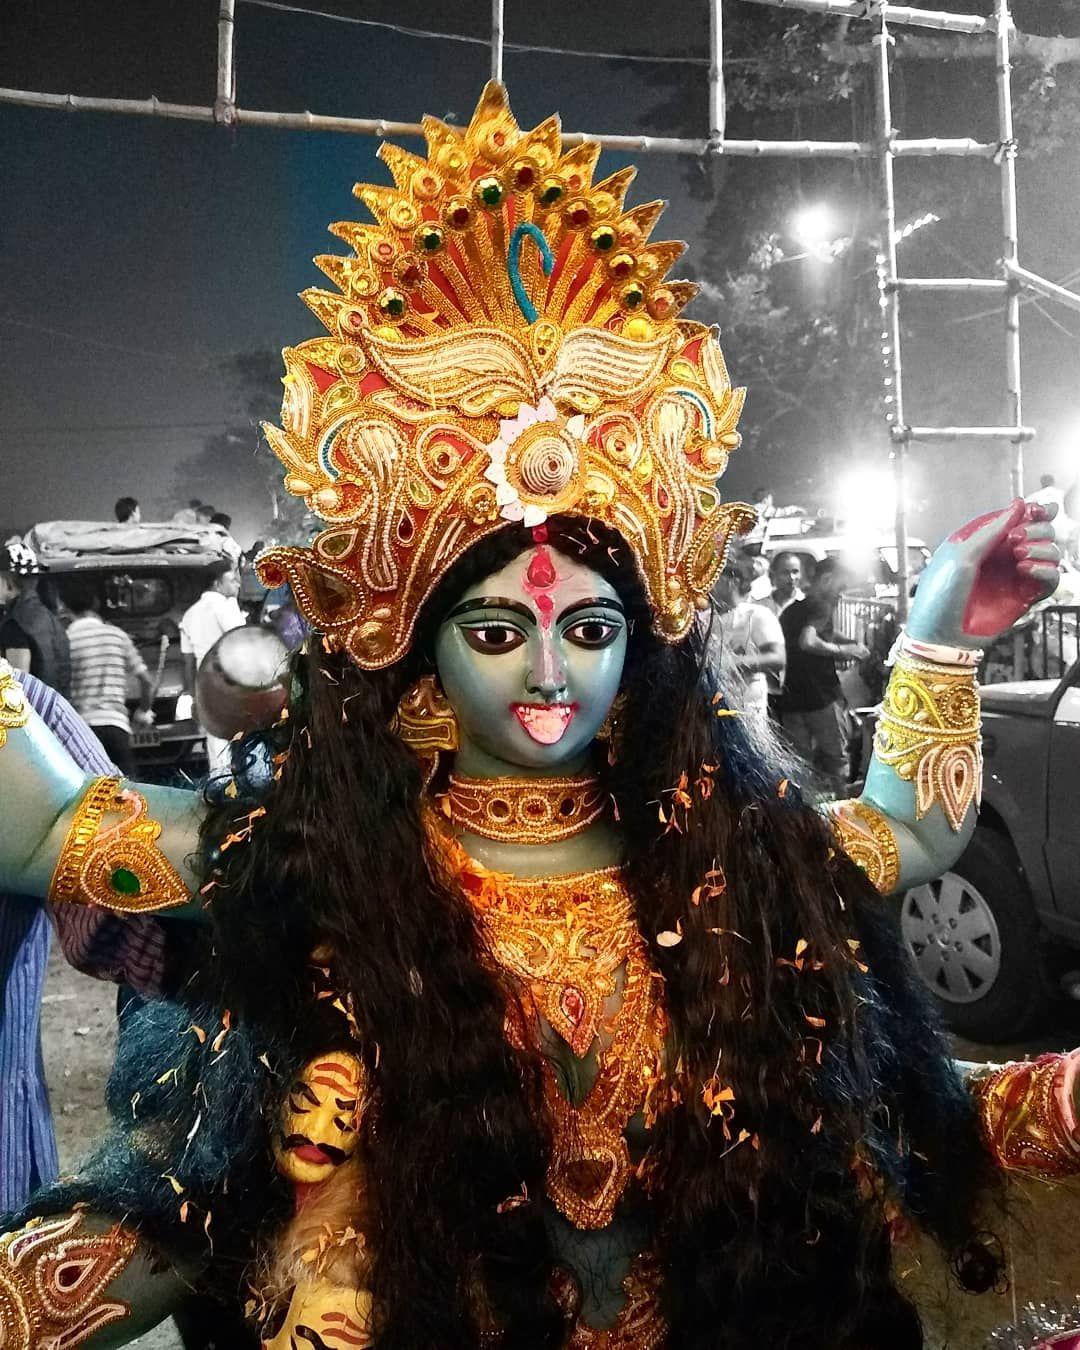 The colourful one. See you next year, Maa. . #KaliPujo #Kali #Diwali #Diwali2018 #Bhashan #Visarjan #Kolkata #Babughat | Kali goddess, Maa kali images, Kali mata